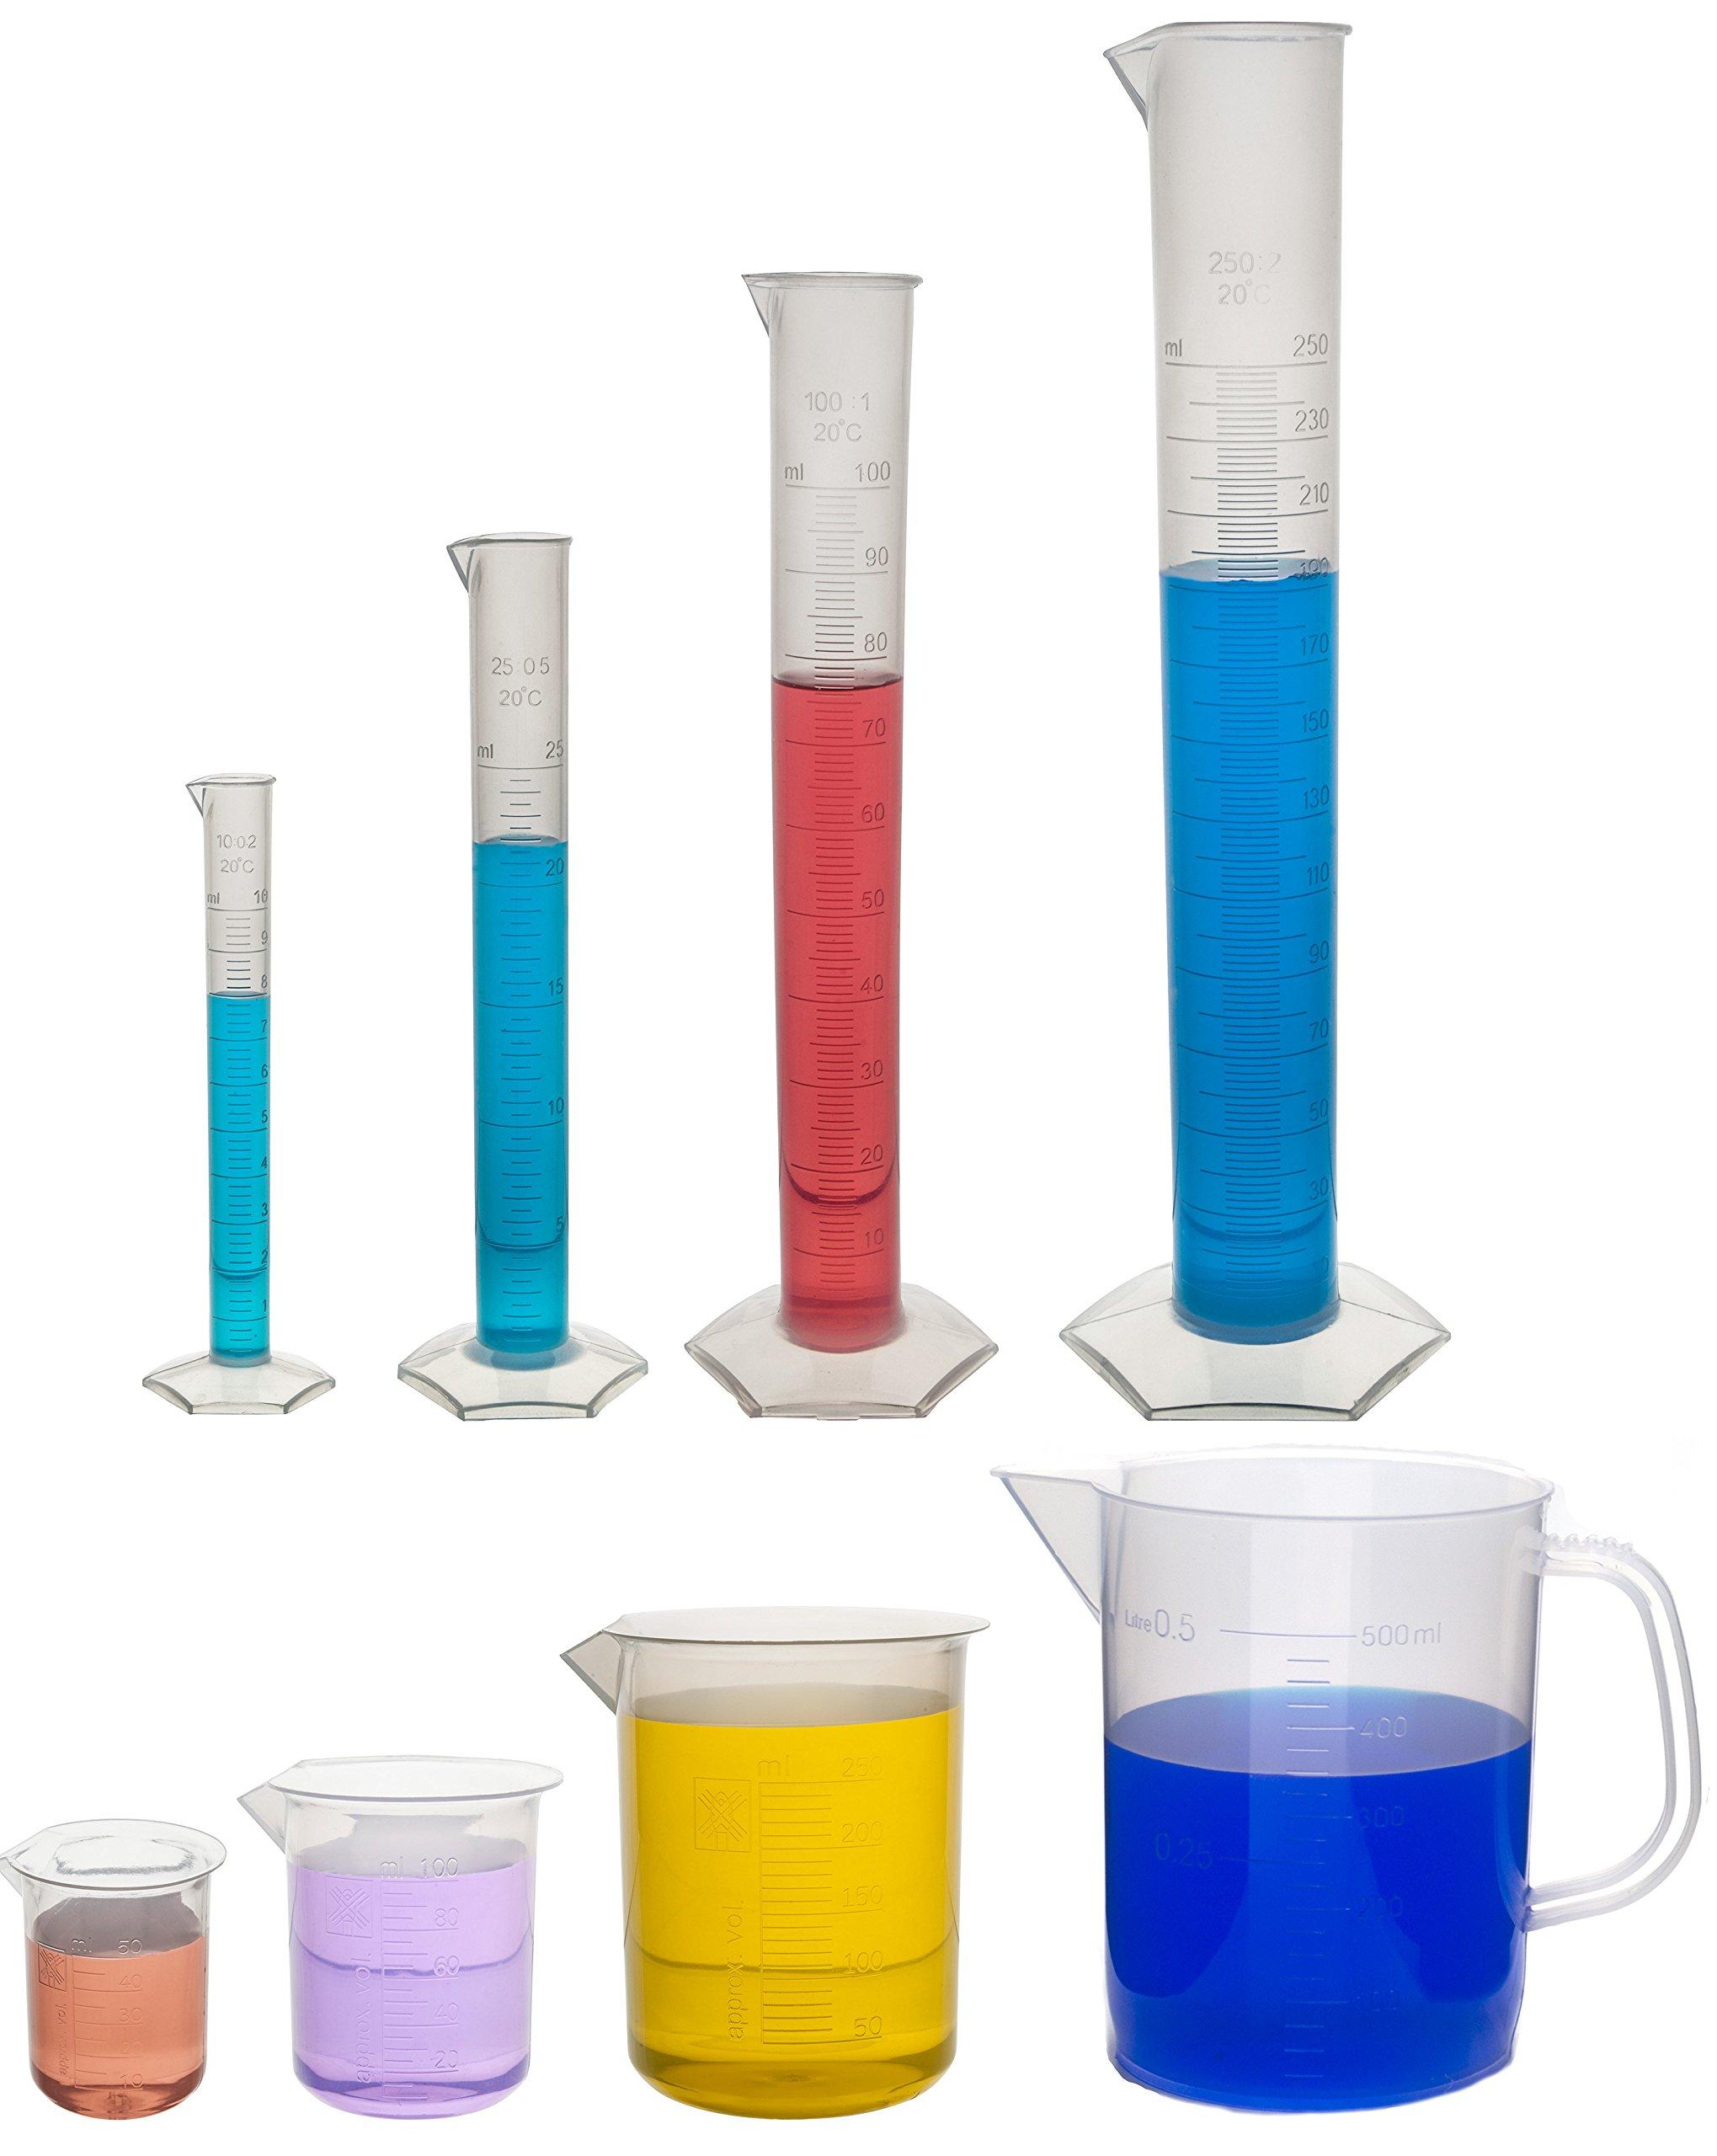 Polypropylene Plastic Measuring Volume Set - 3 Beakers, 4 Graduated Cylinders, 1 Pitcher